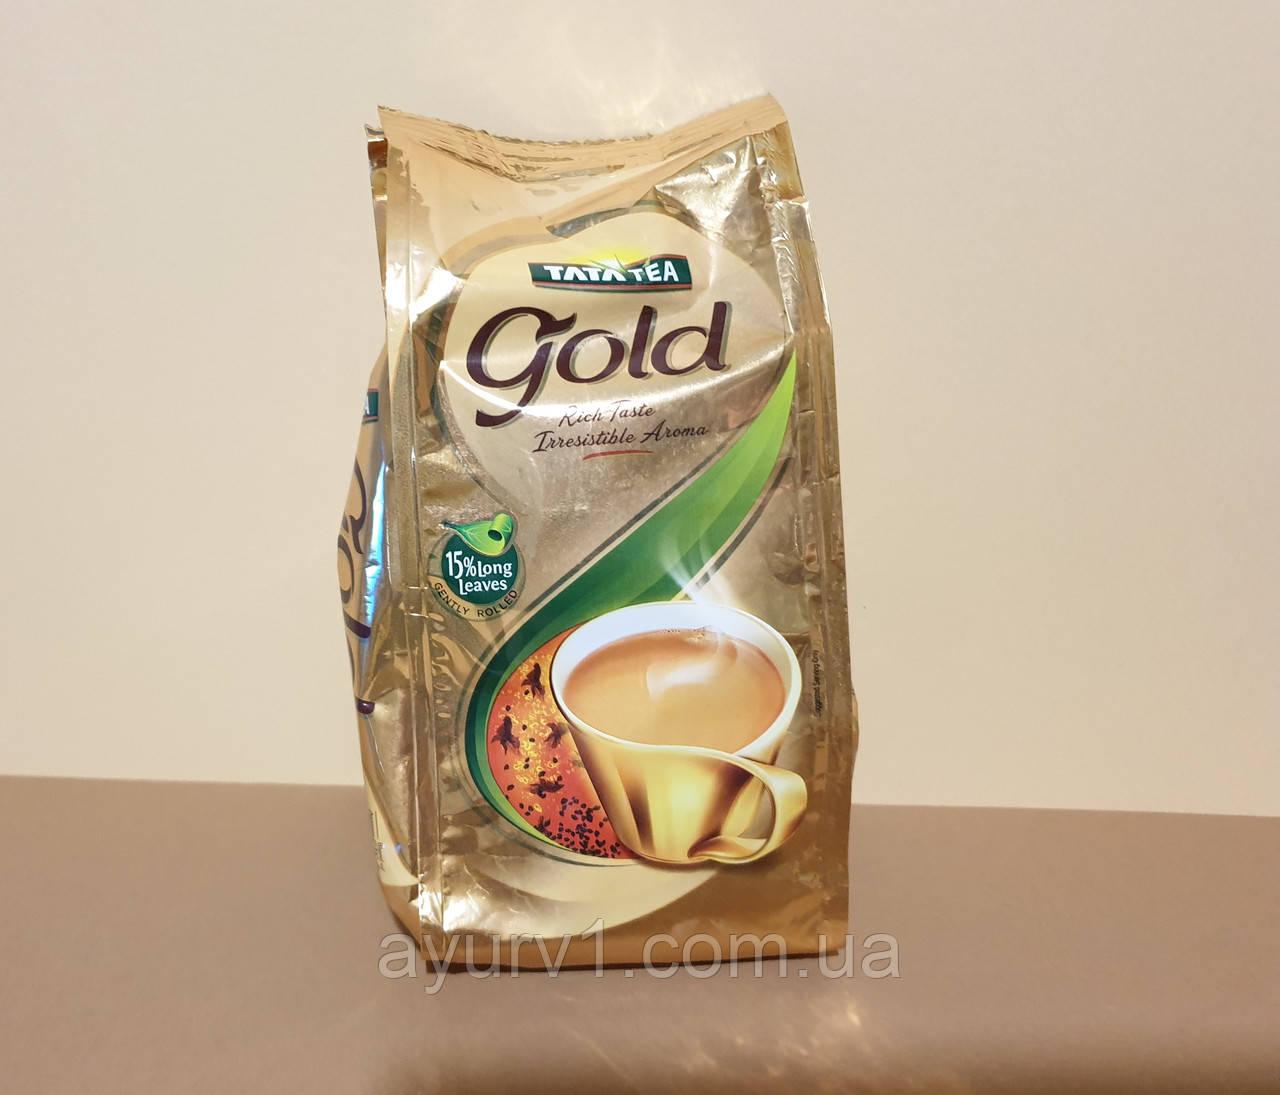 Чай Тата Золотой / Tata The Gold / 250 gr